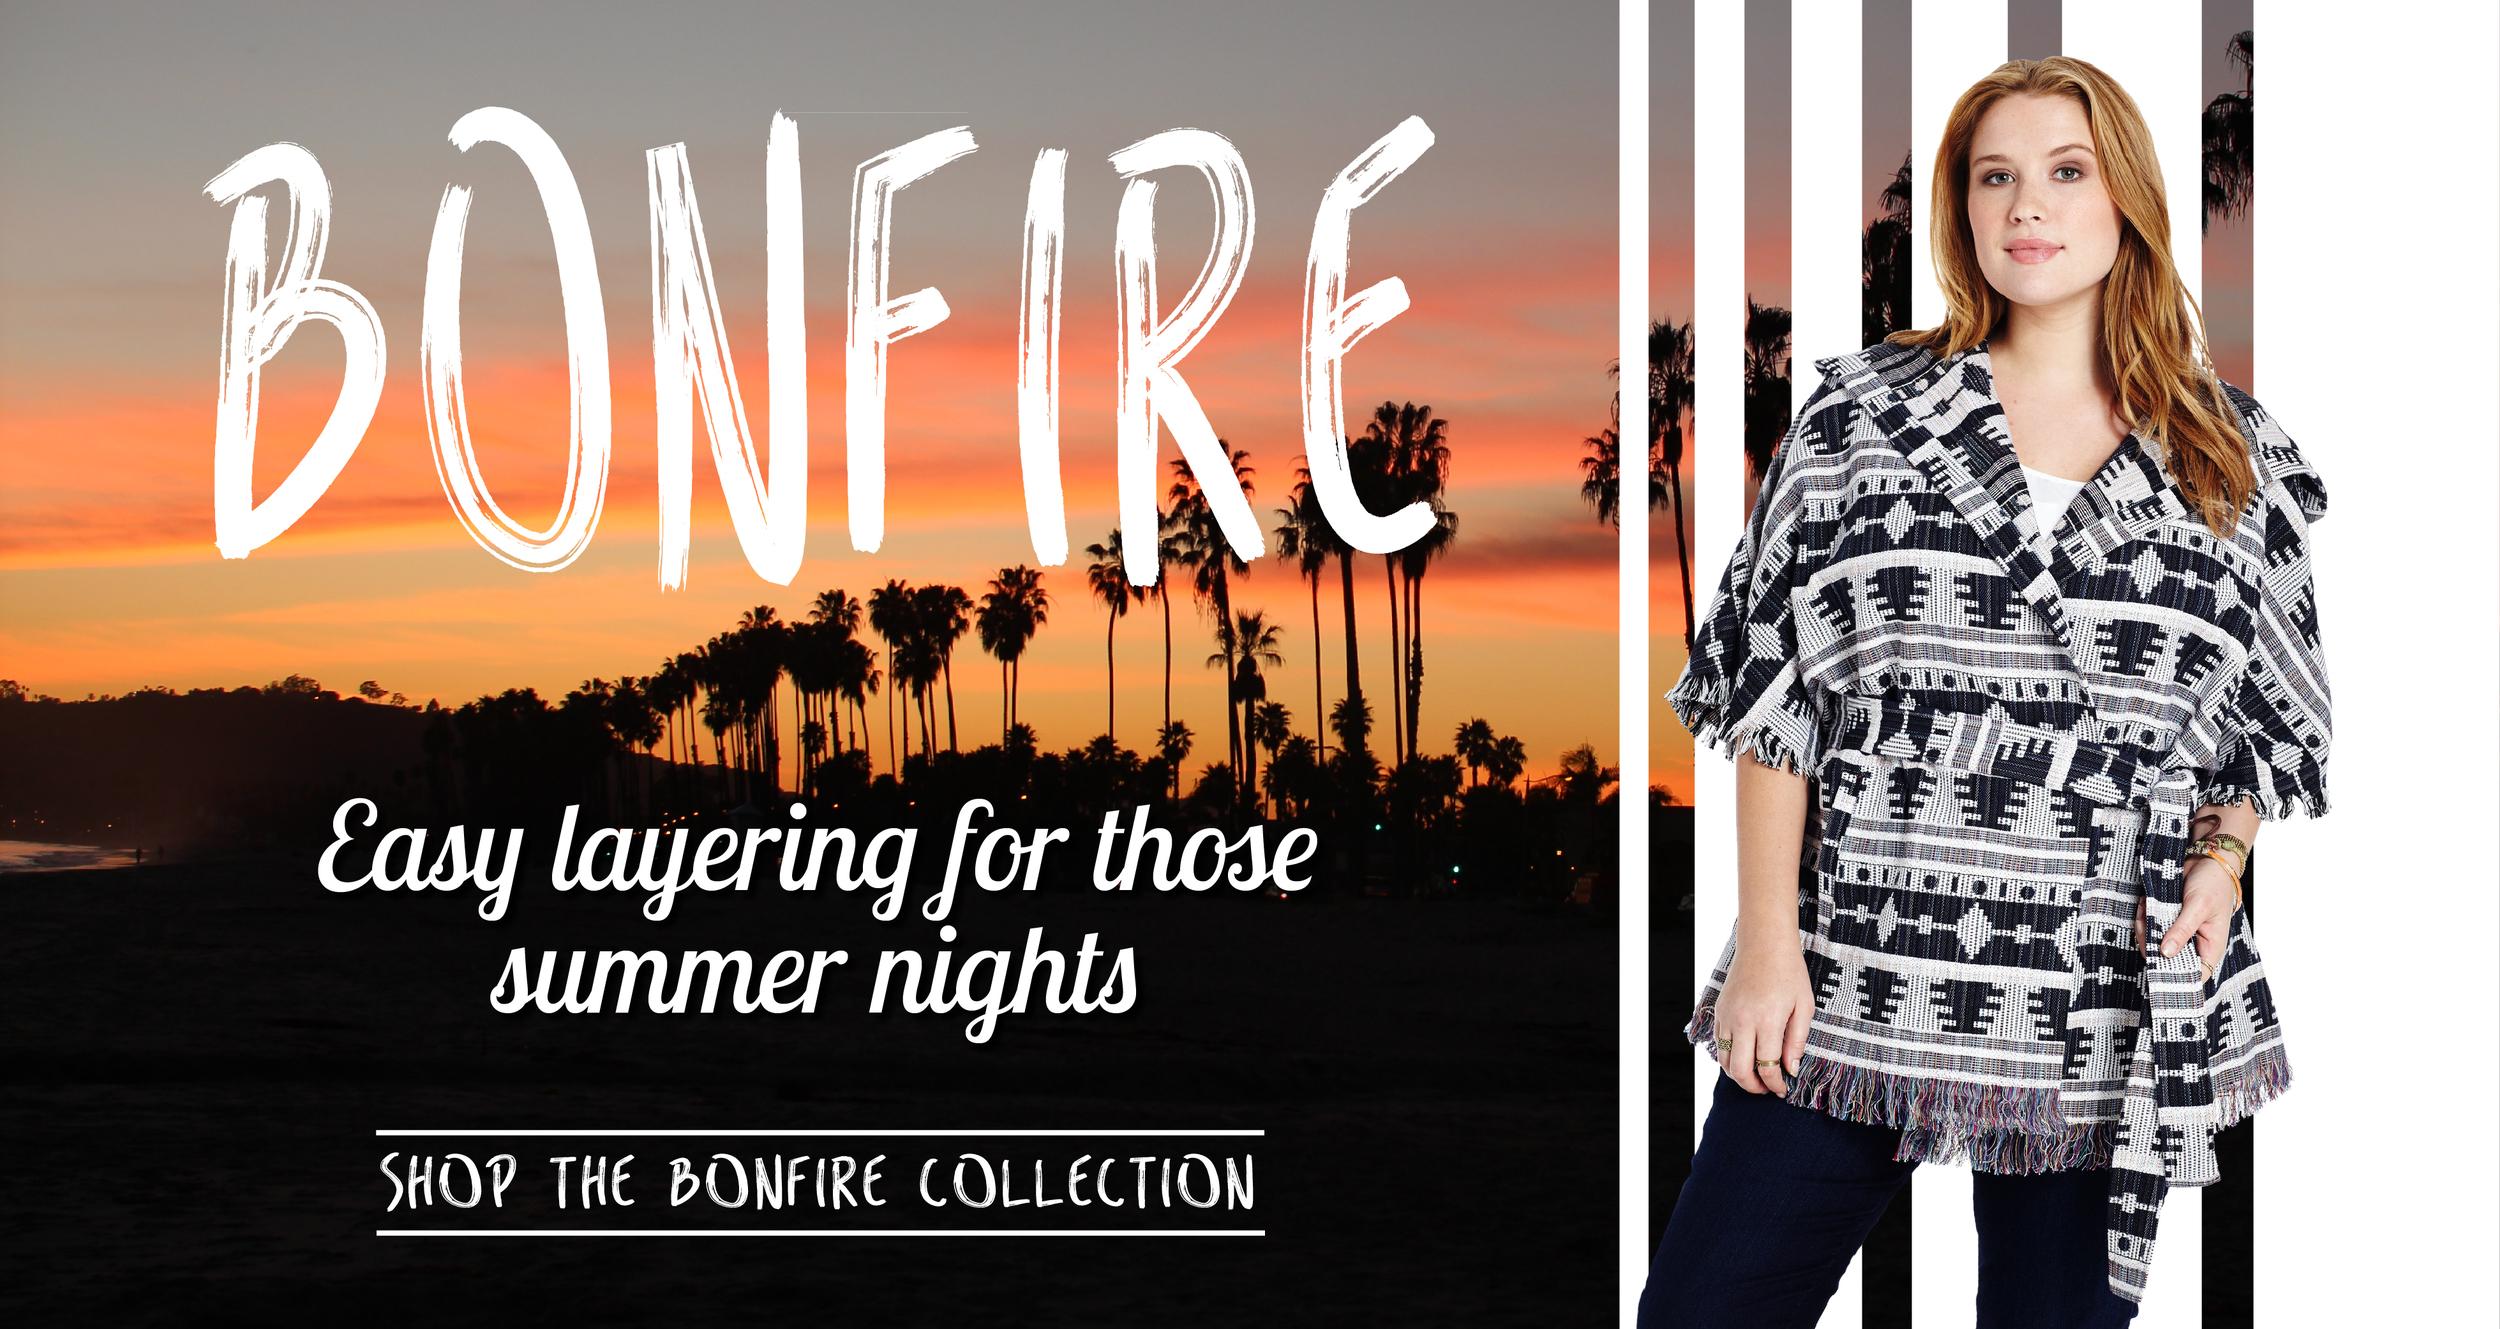 BonfireNights_Homepage_Option3-01.jpg